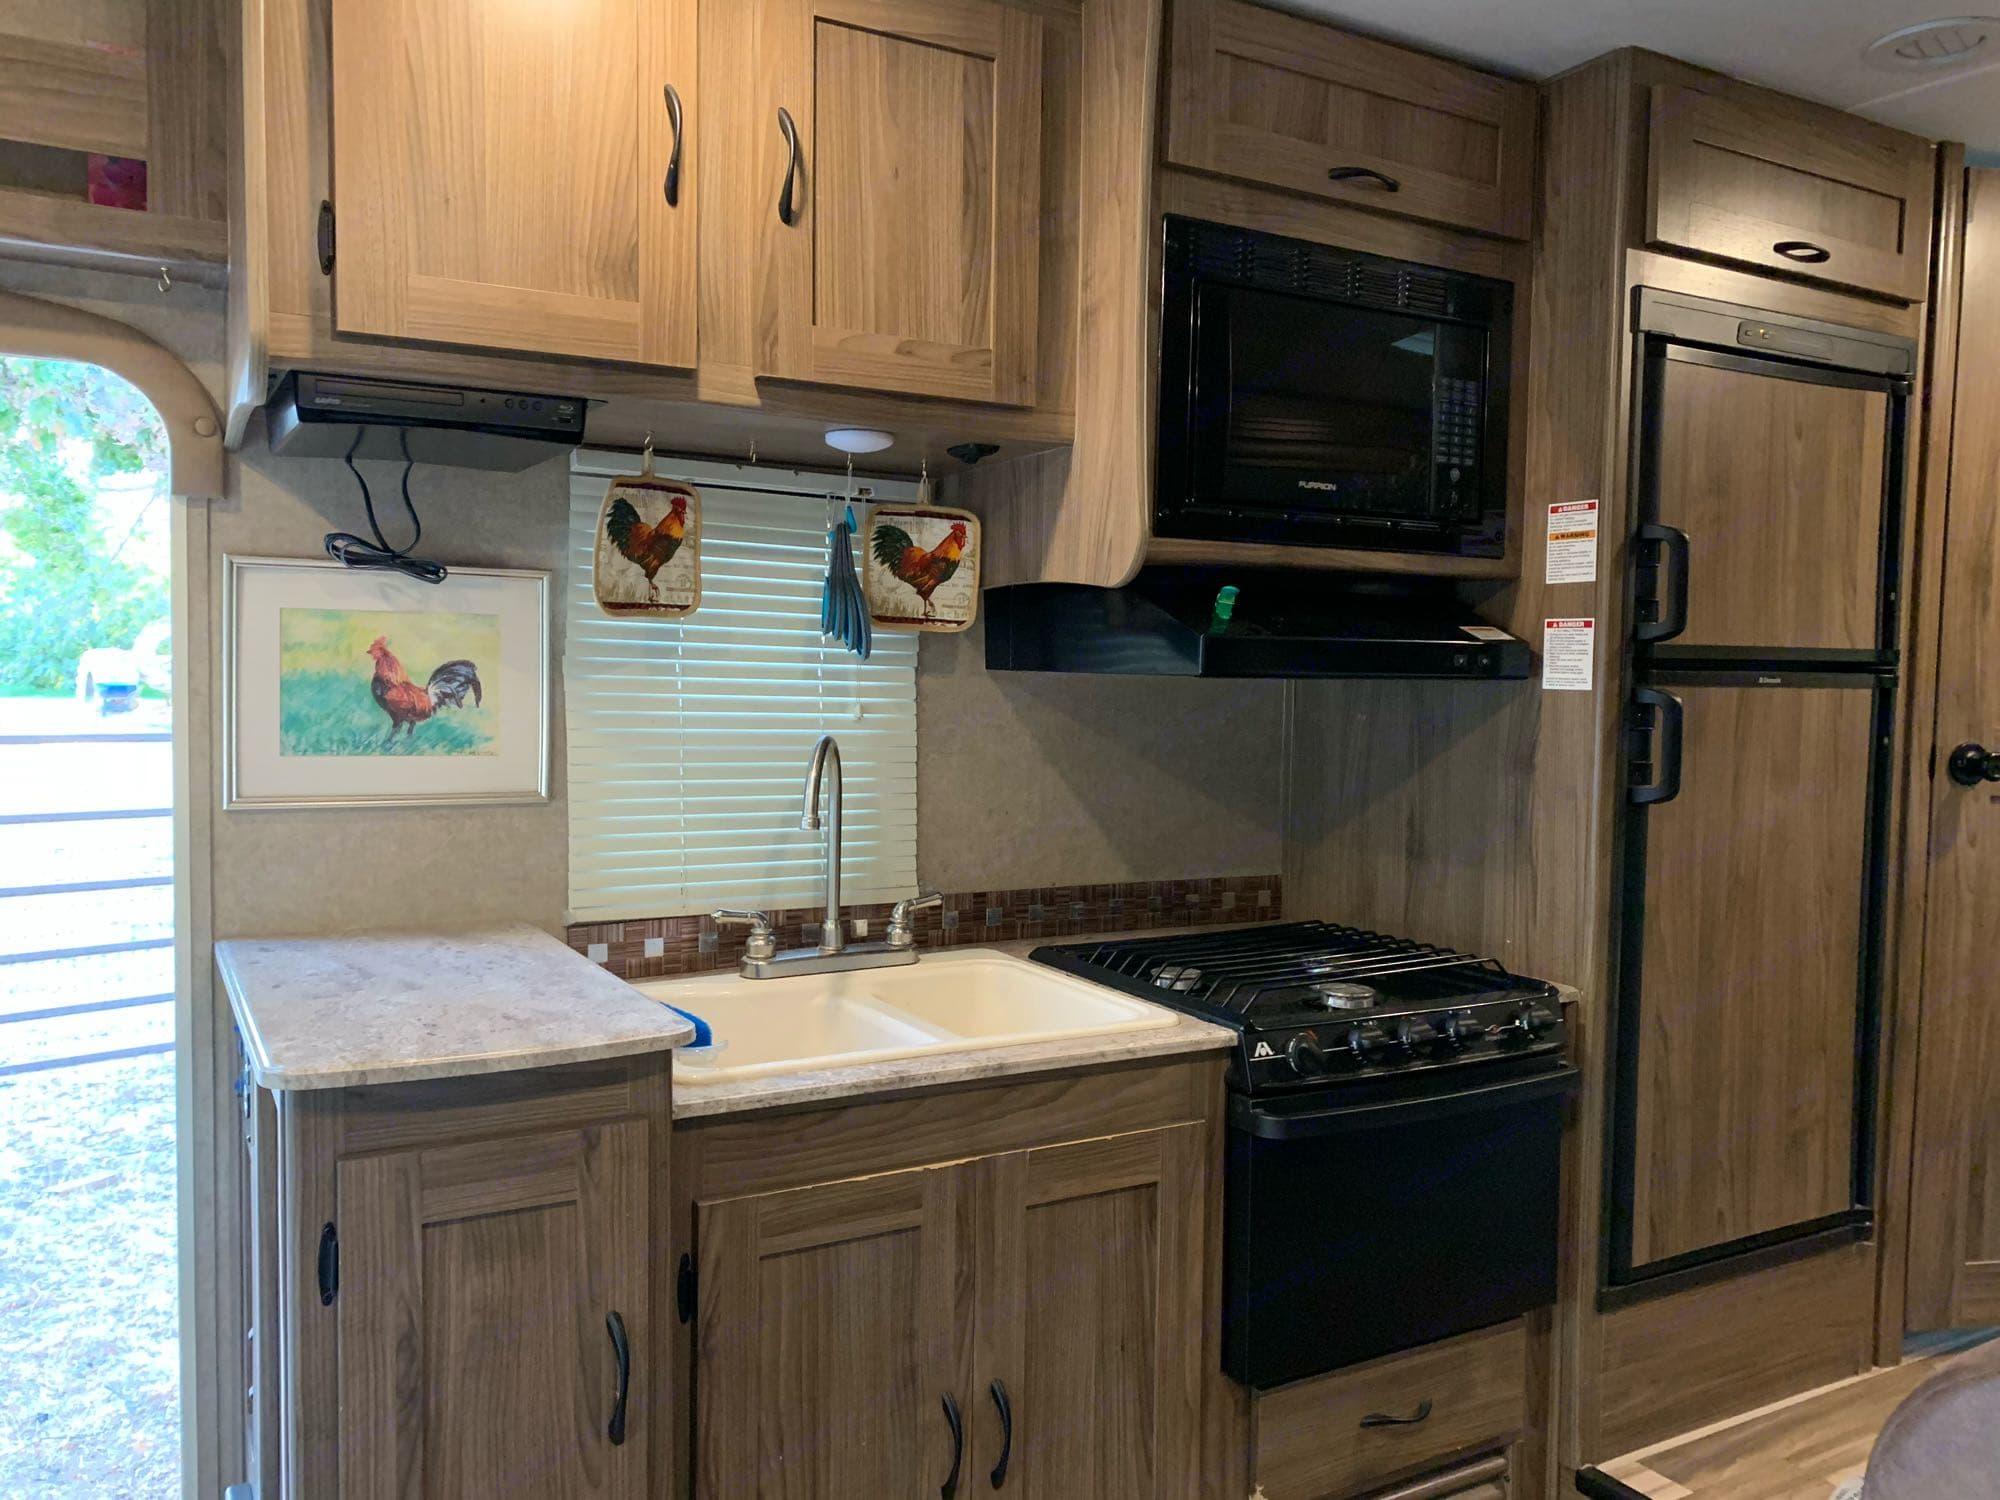 full kitchen and refrigerator. Coachmen Freelander 2016